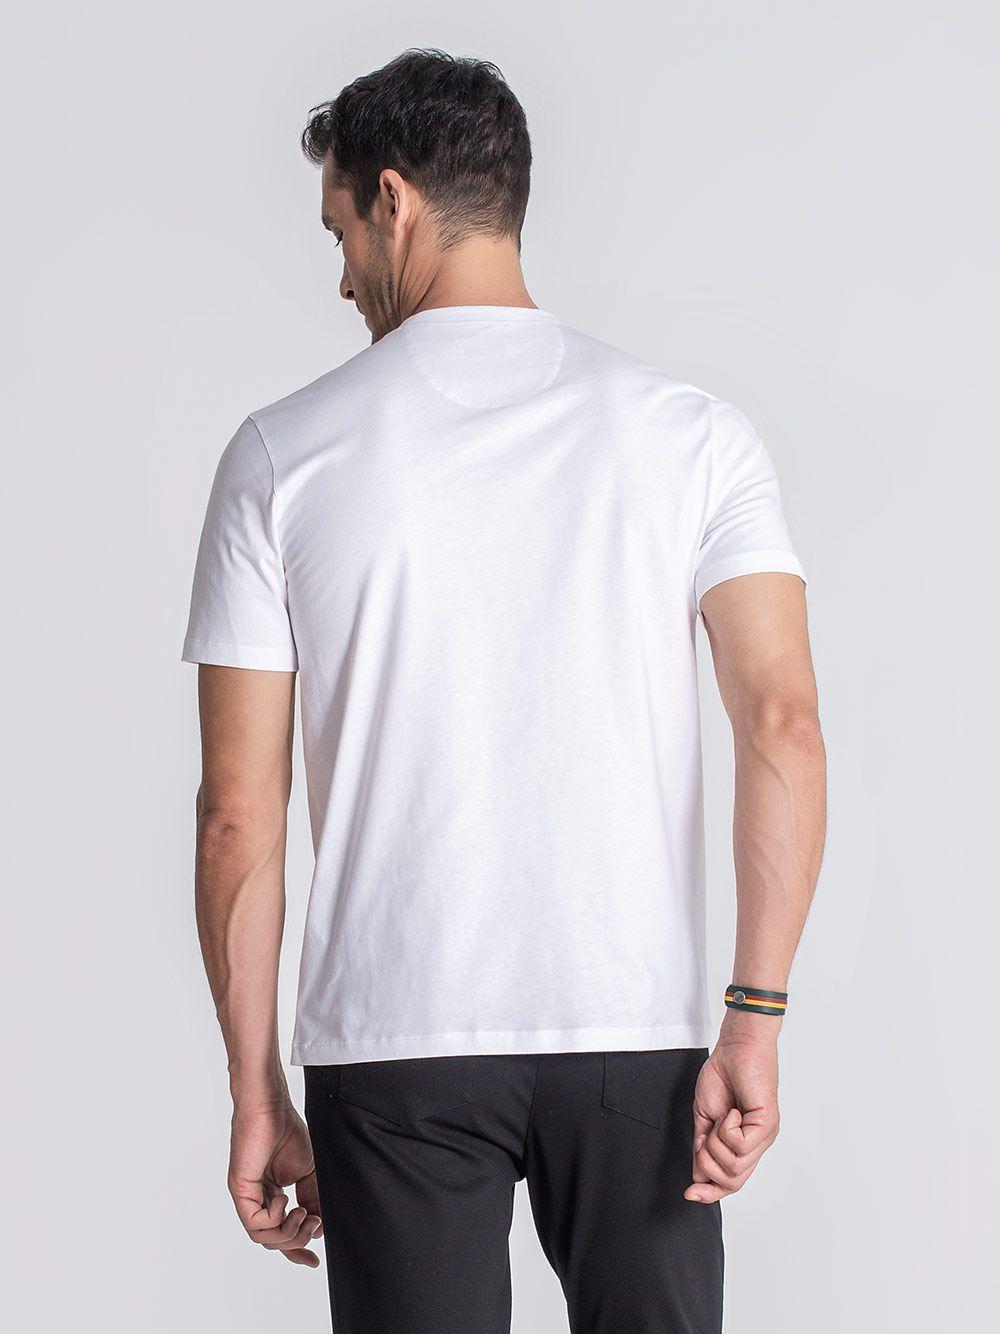 T-shirt Clinton Branco | JEF